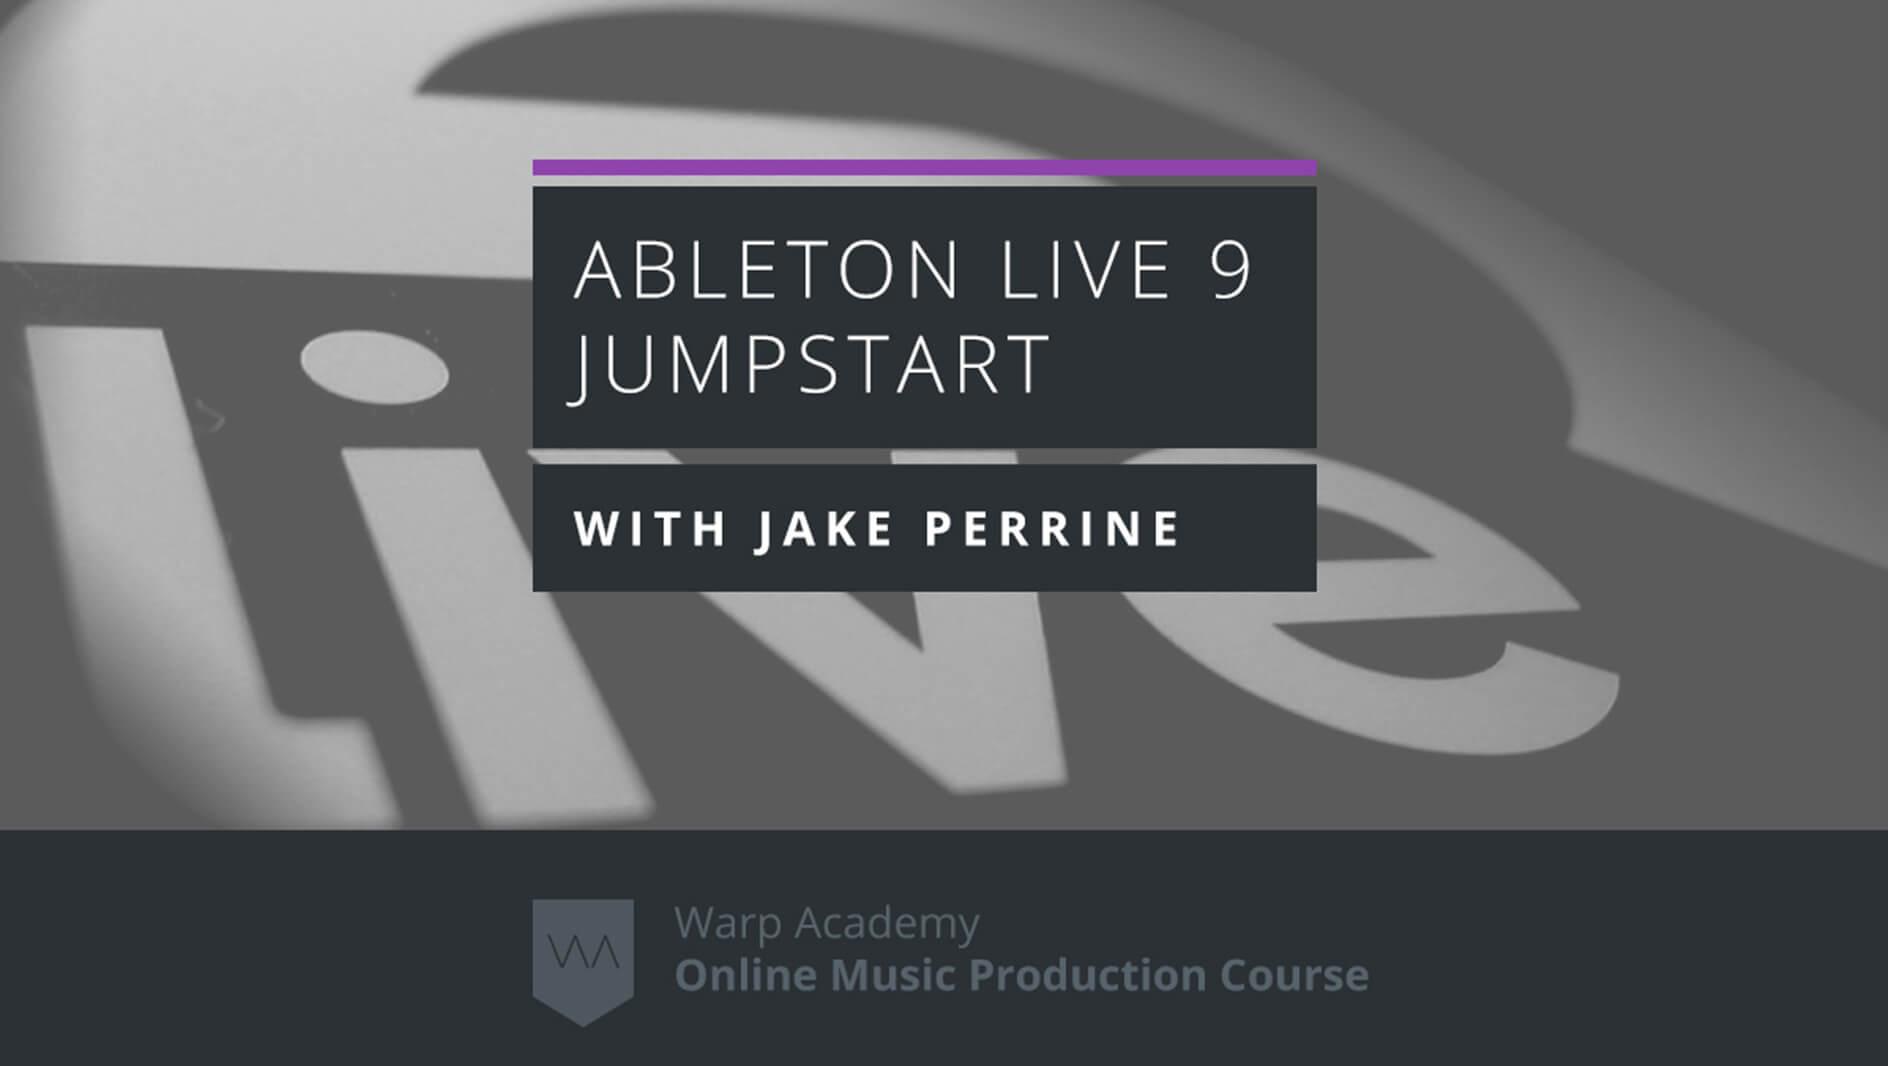 Ableton Live 9 Jumpstart